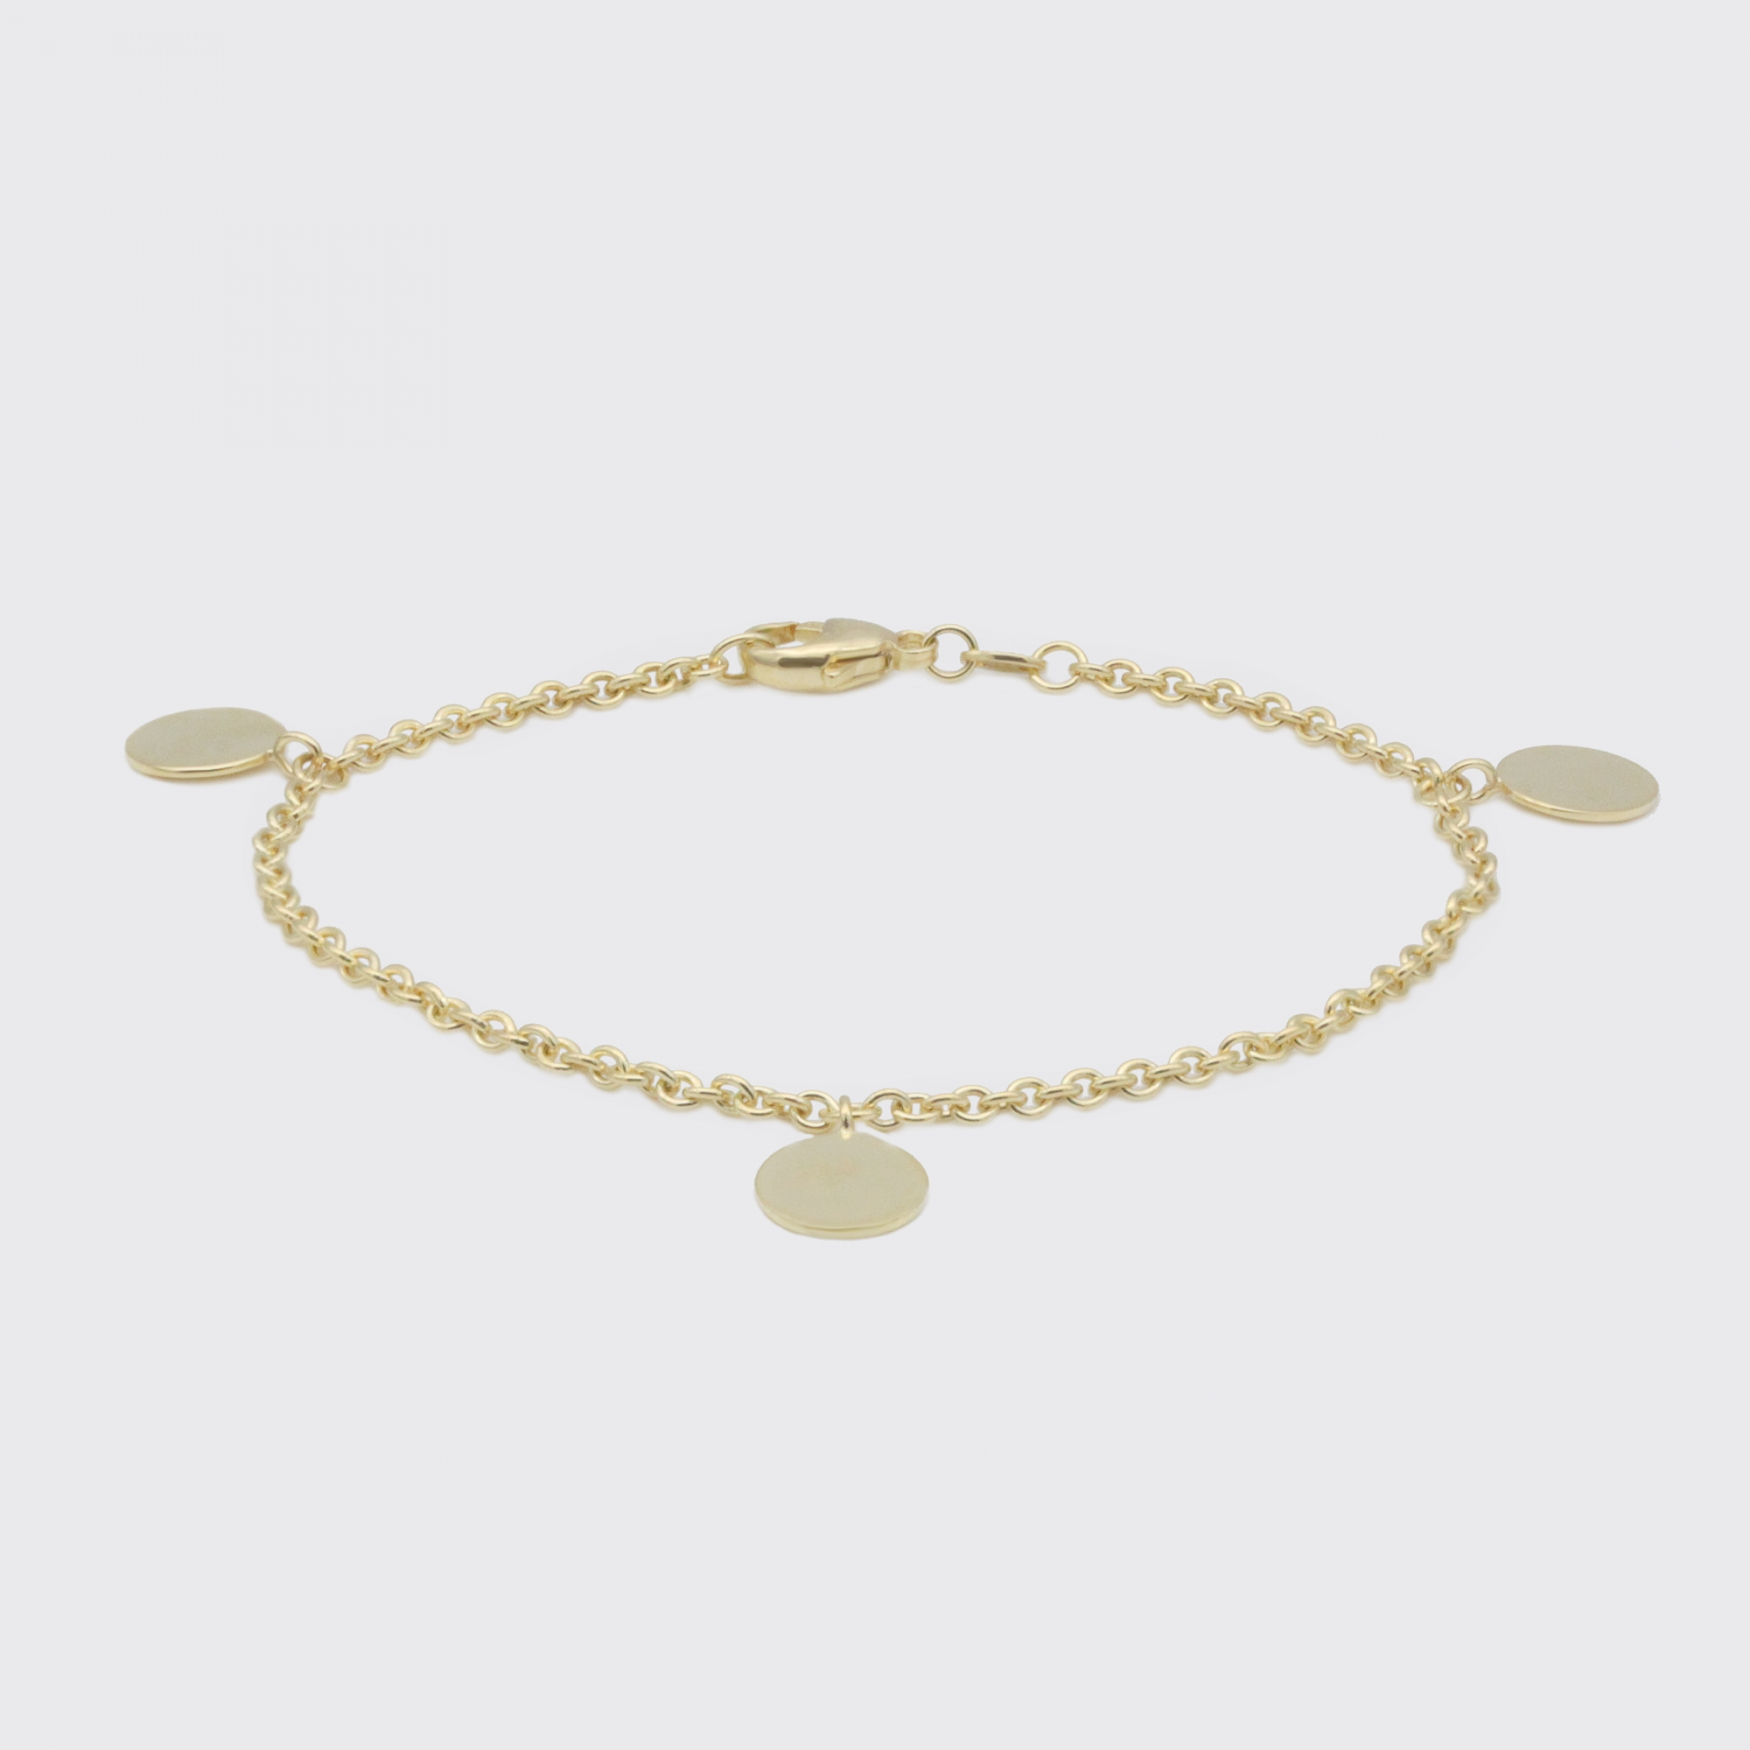 Armband - 3 Gelbgoldplaketten